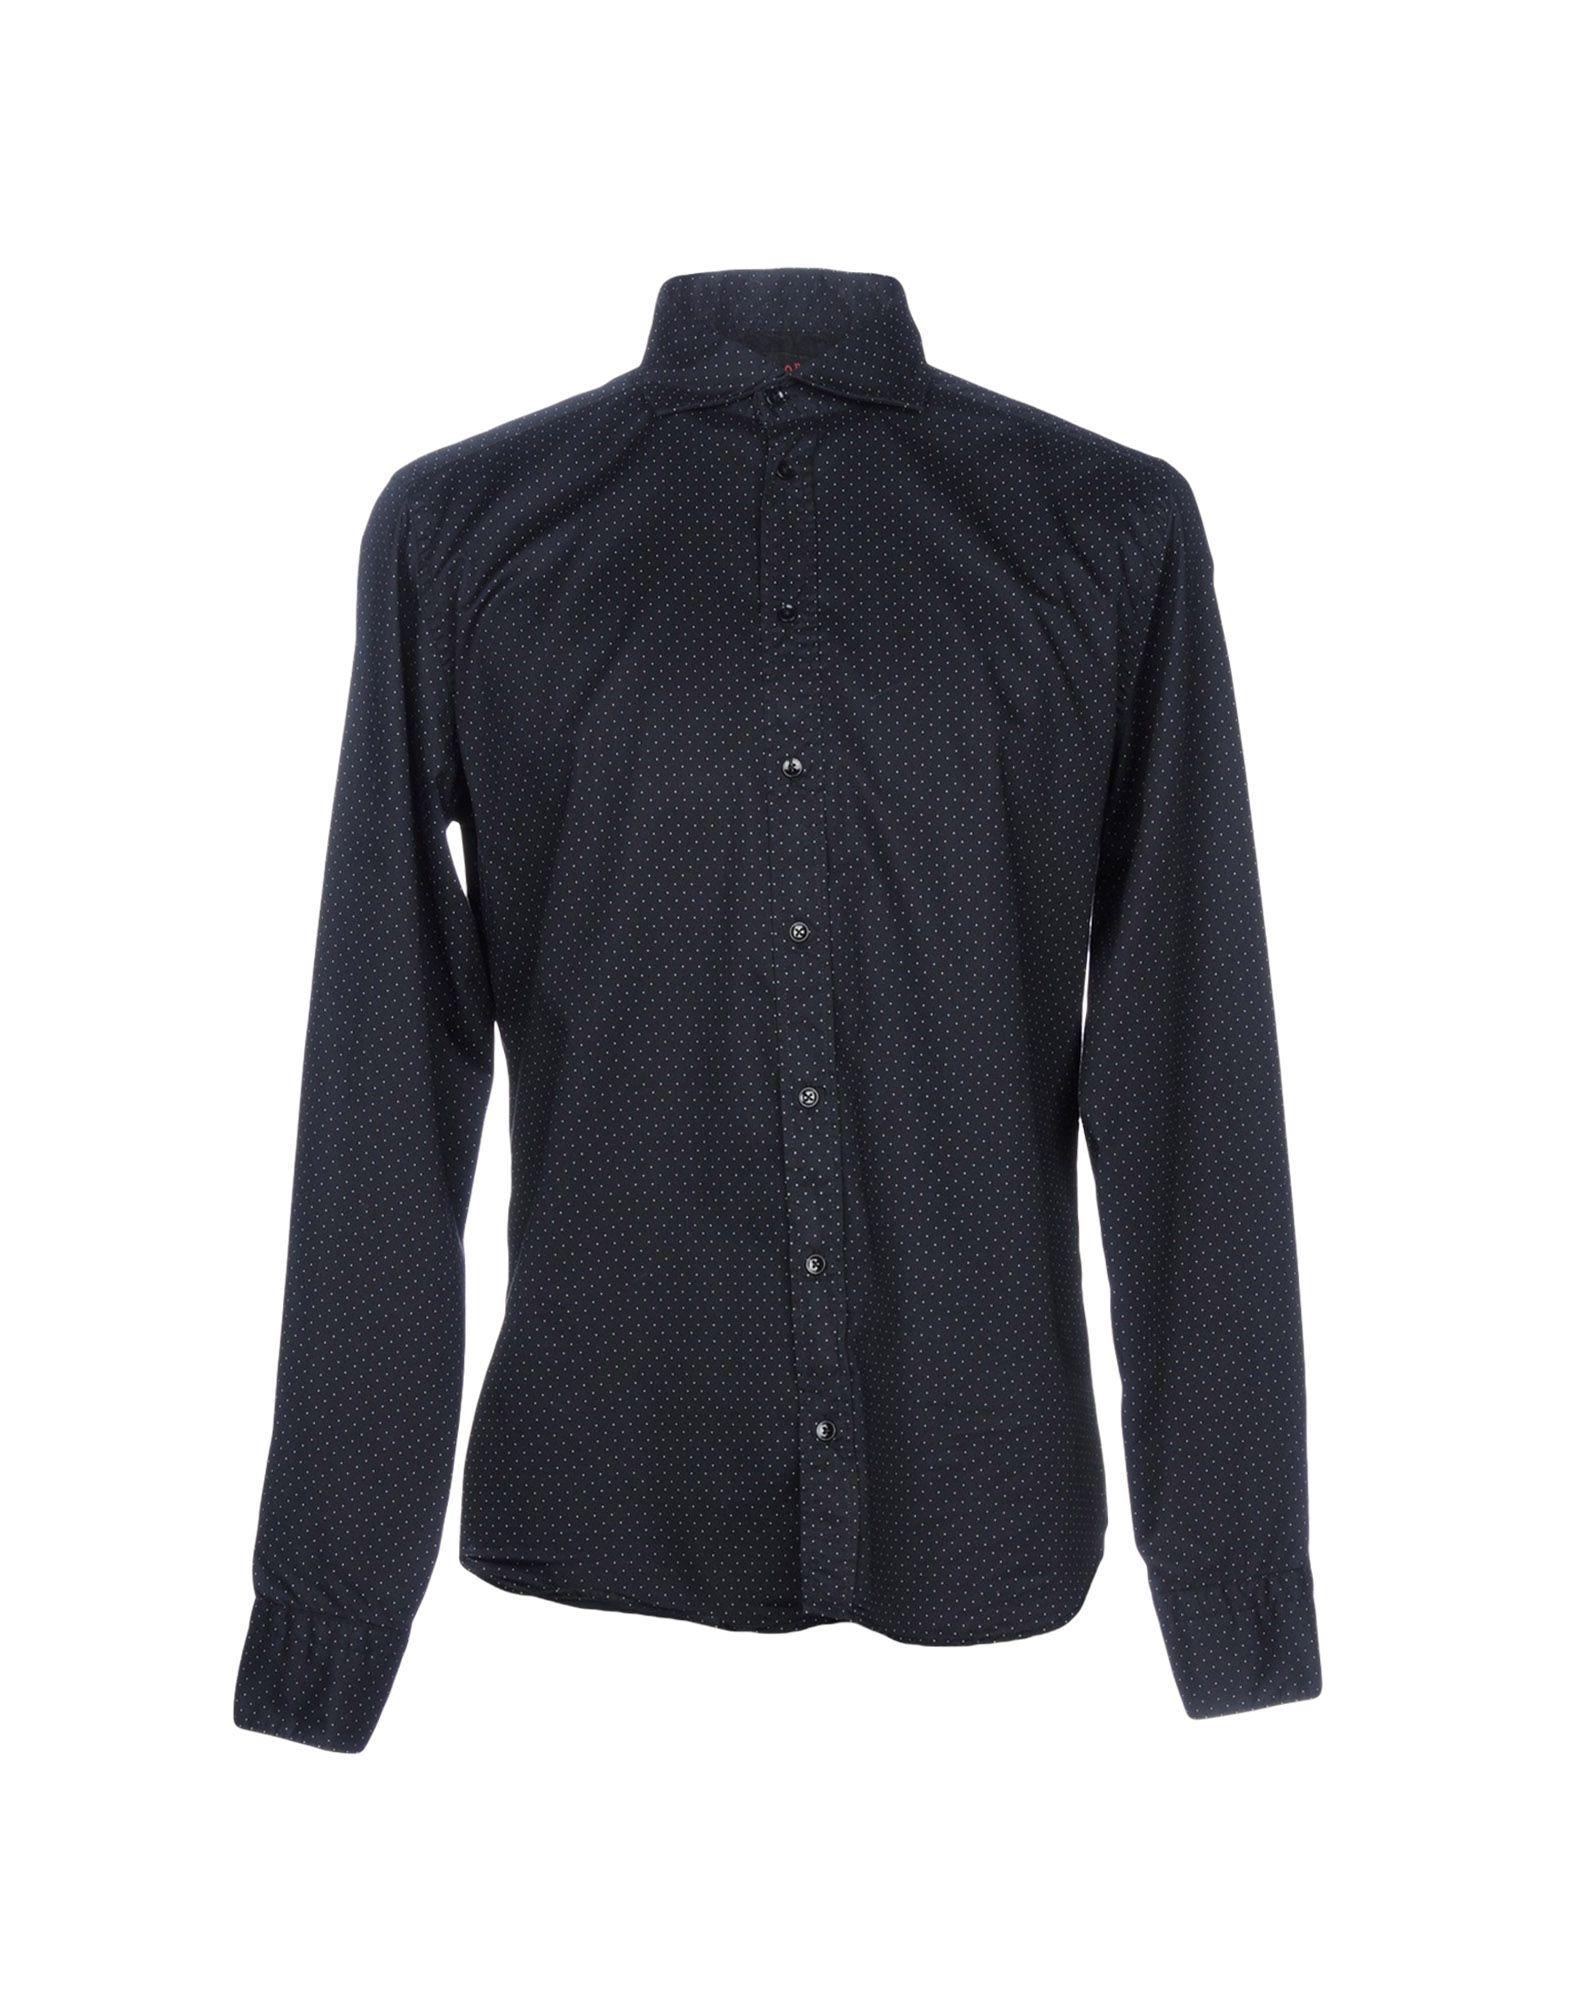 VAPOFORNO MILANO Pубашка блуза xs milano блузы в горошек